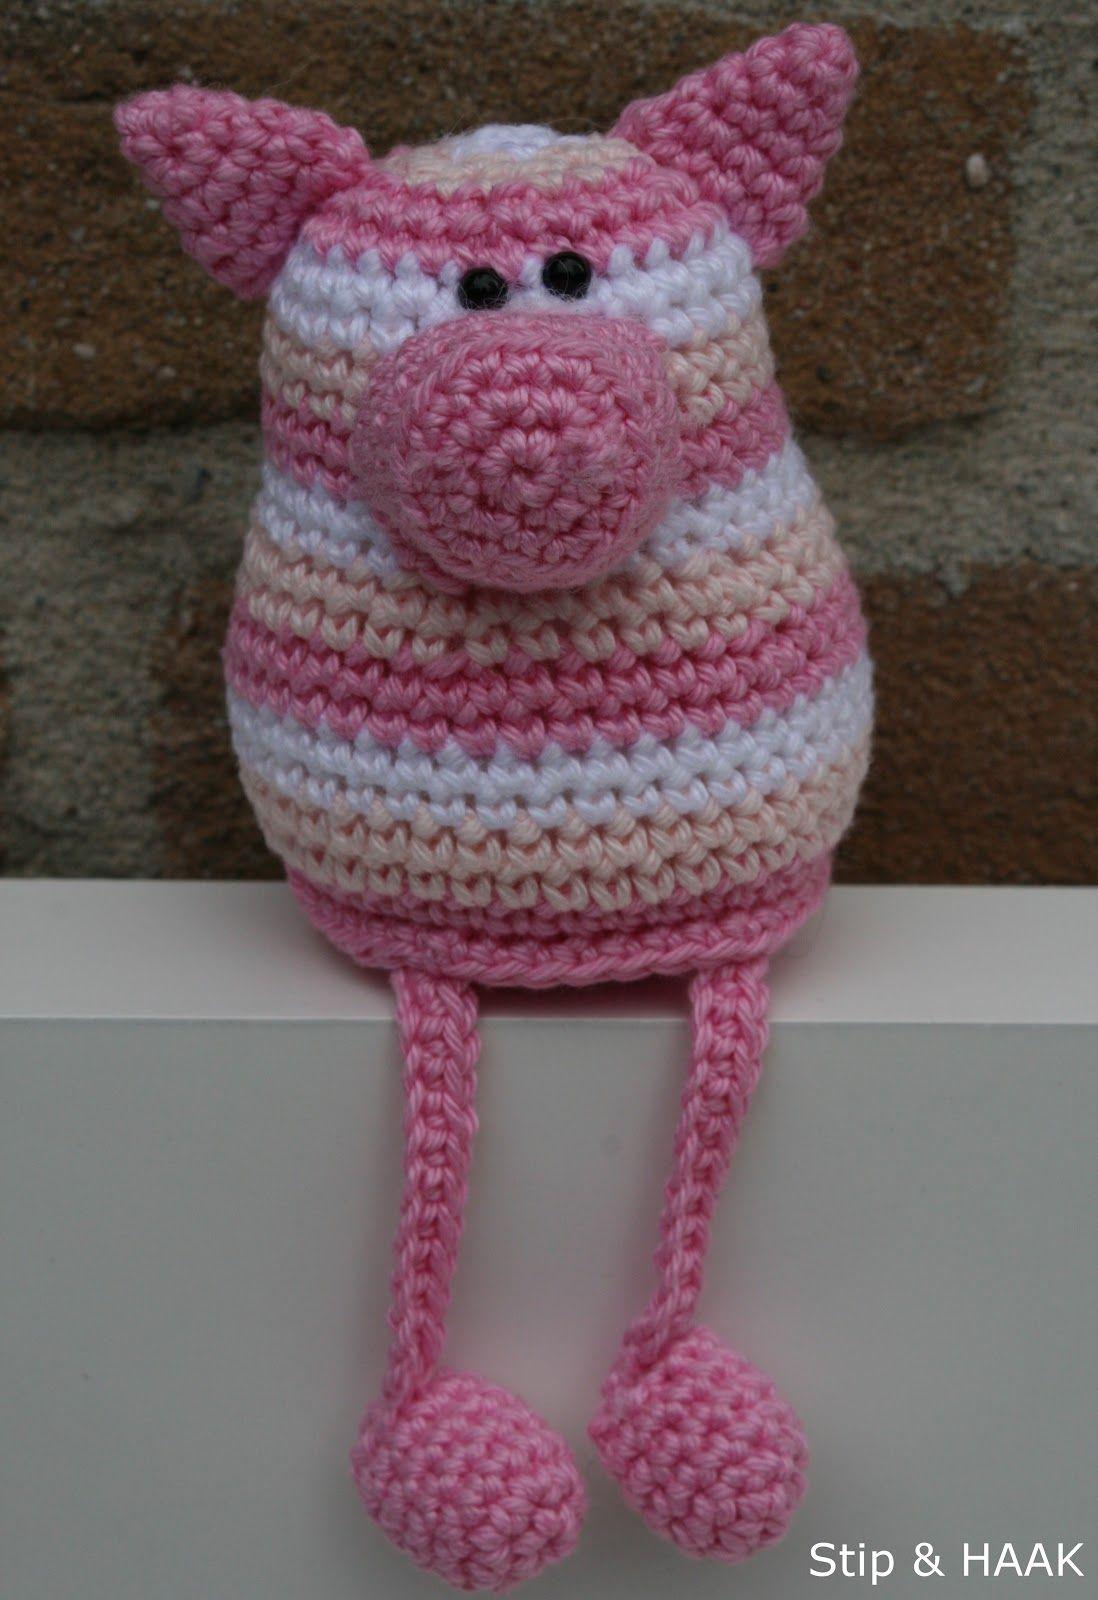 crochet pattern for little pig (in dutch) - Stip & HAAK: Varkentje ...